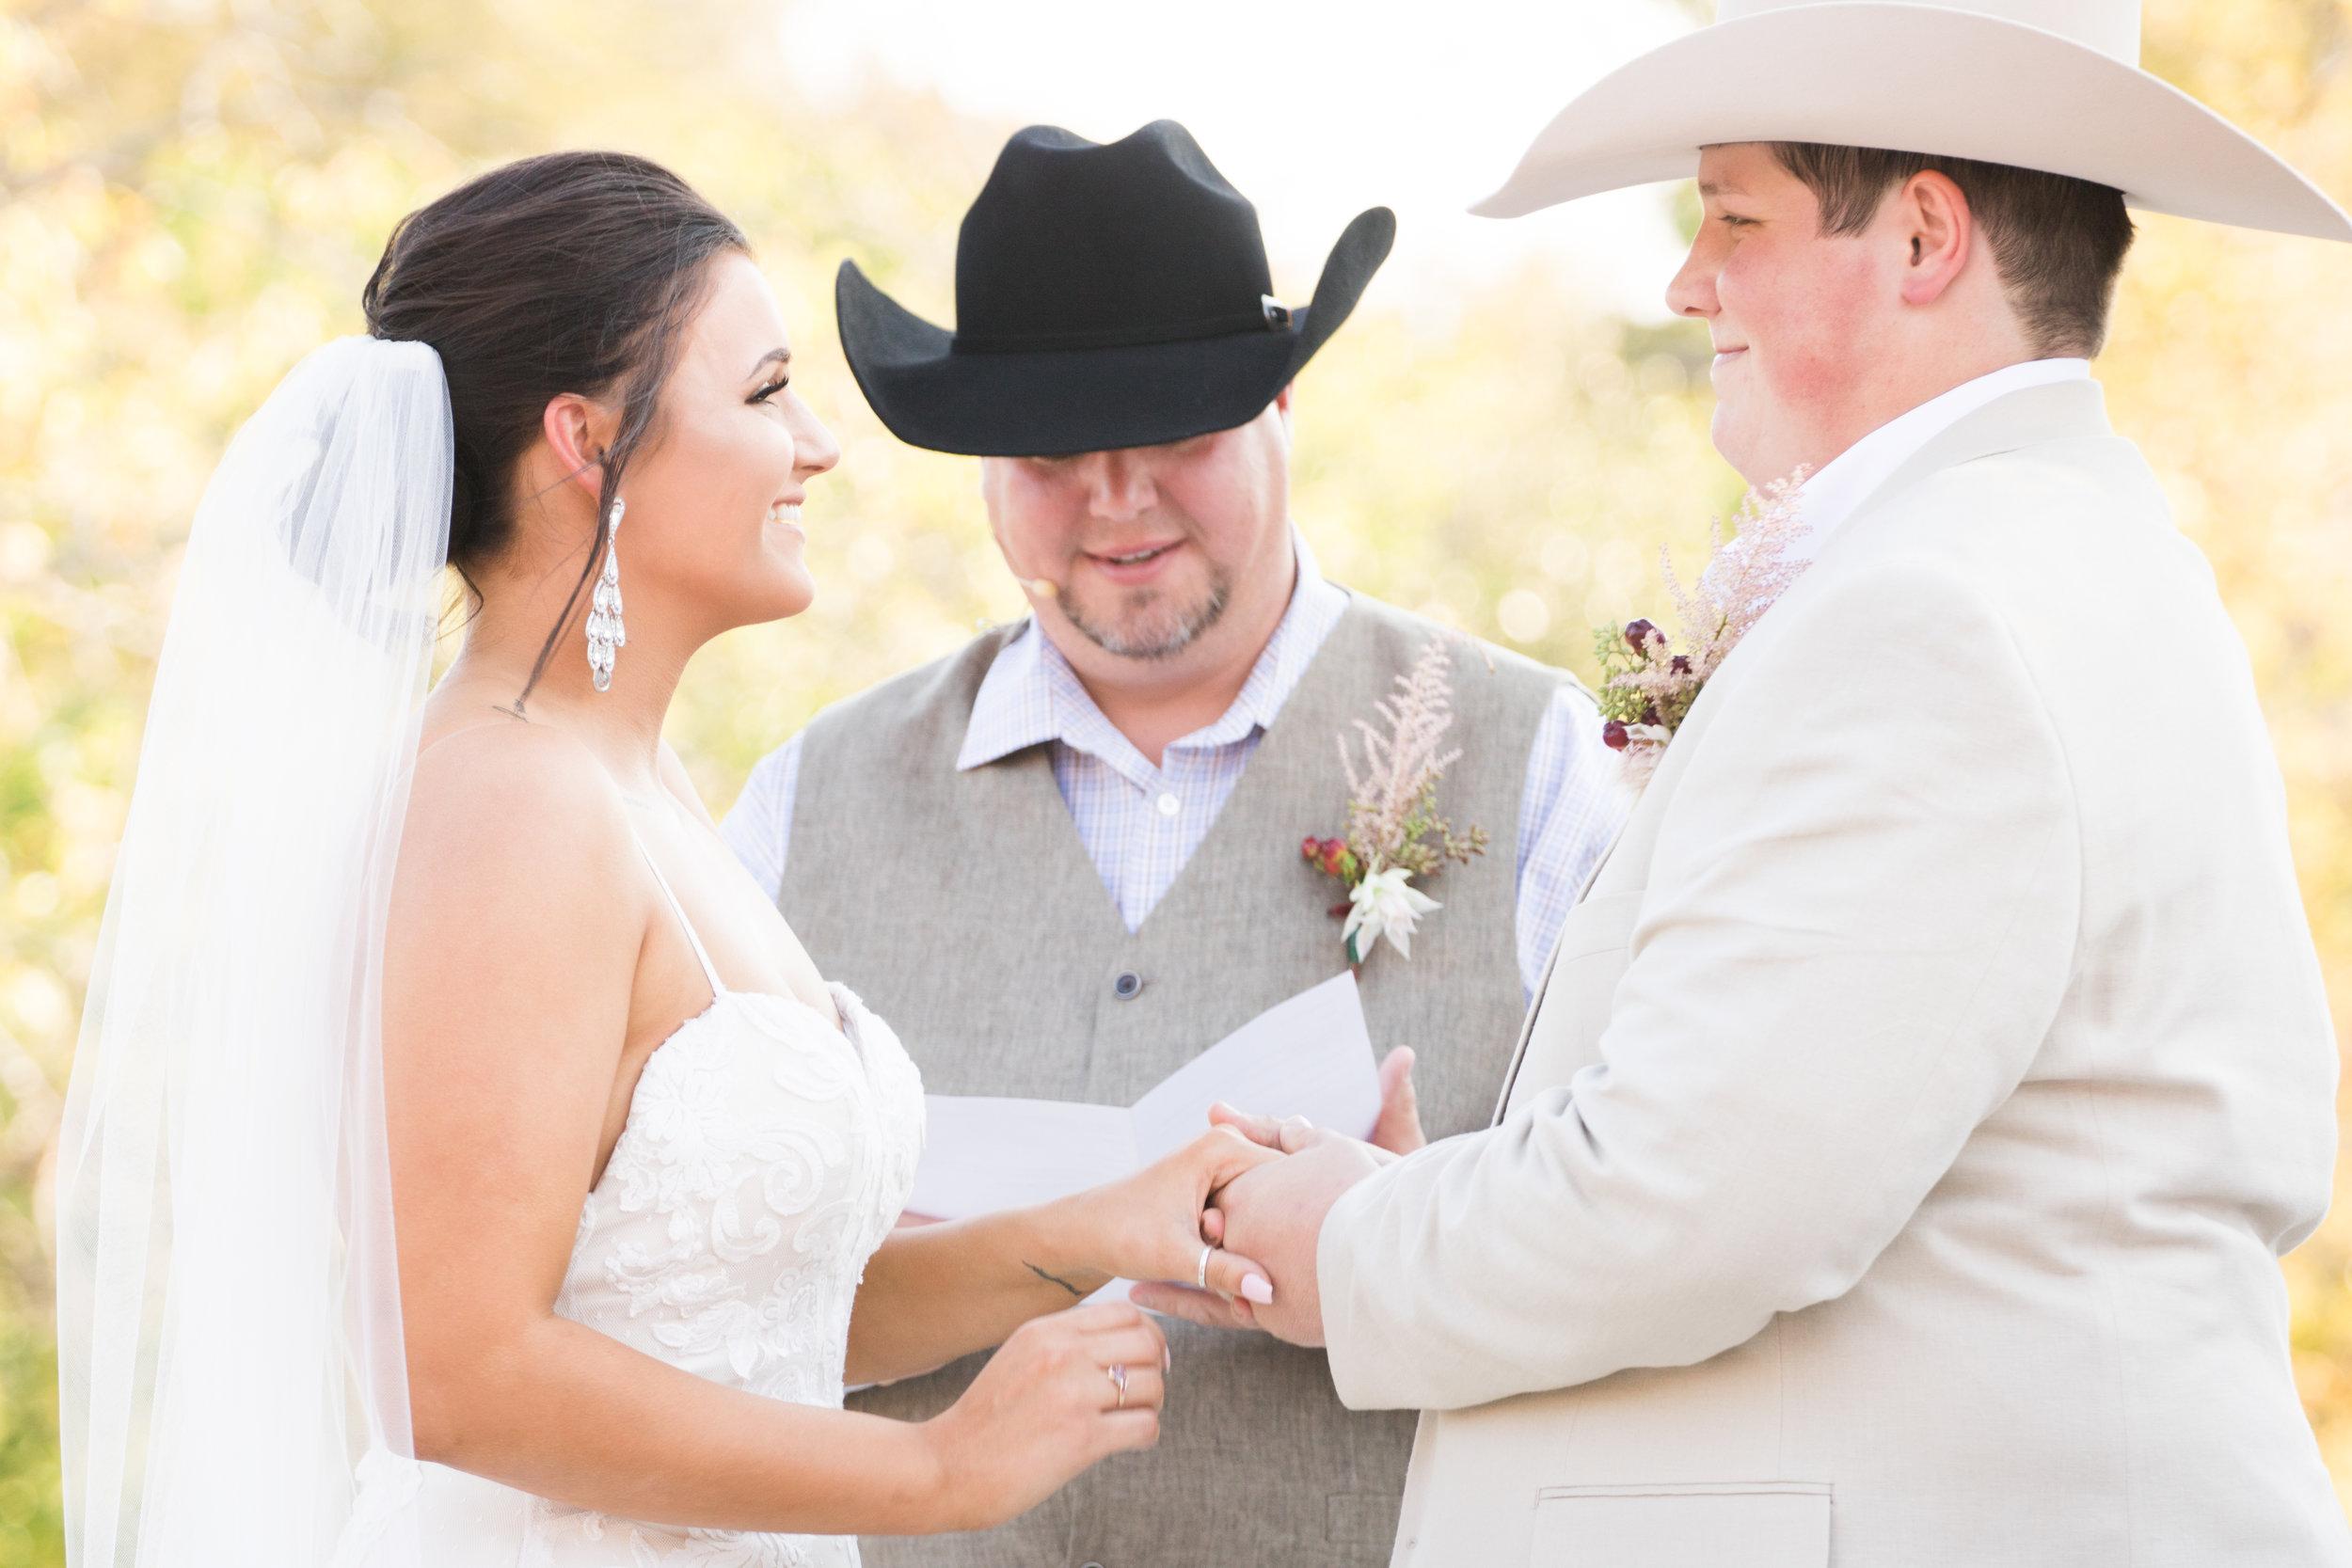 Texas wedding, Hidden Gardens wedding, Country wedding, Custom made dress, cowboy hats.